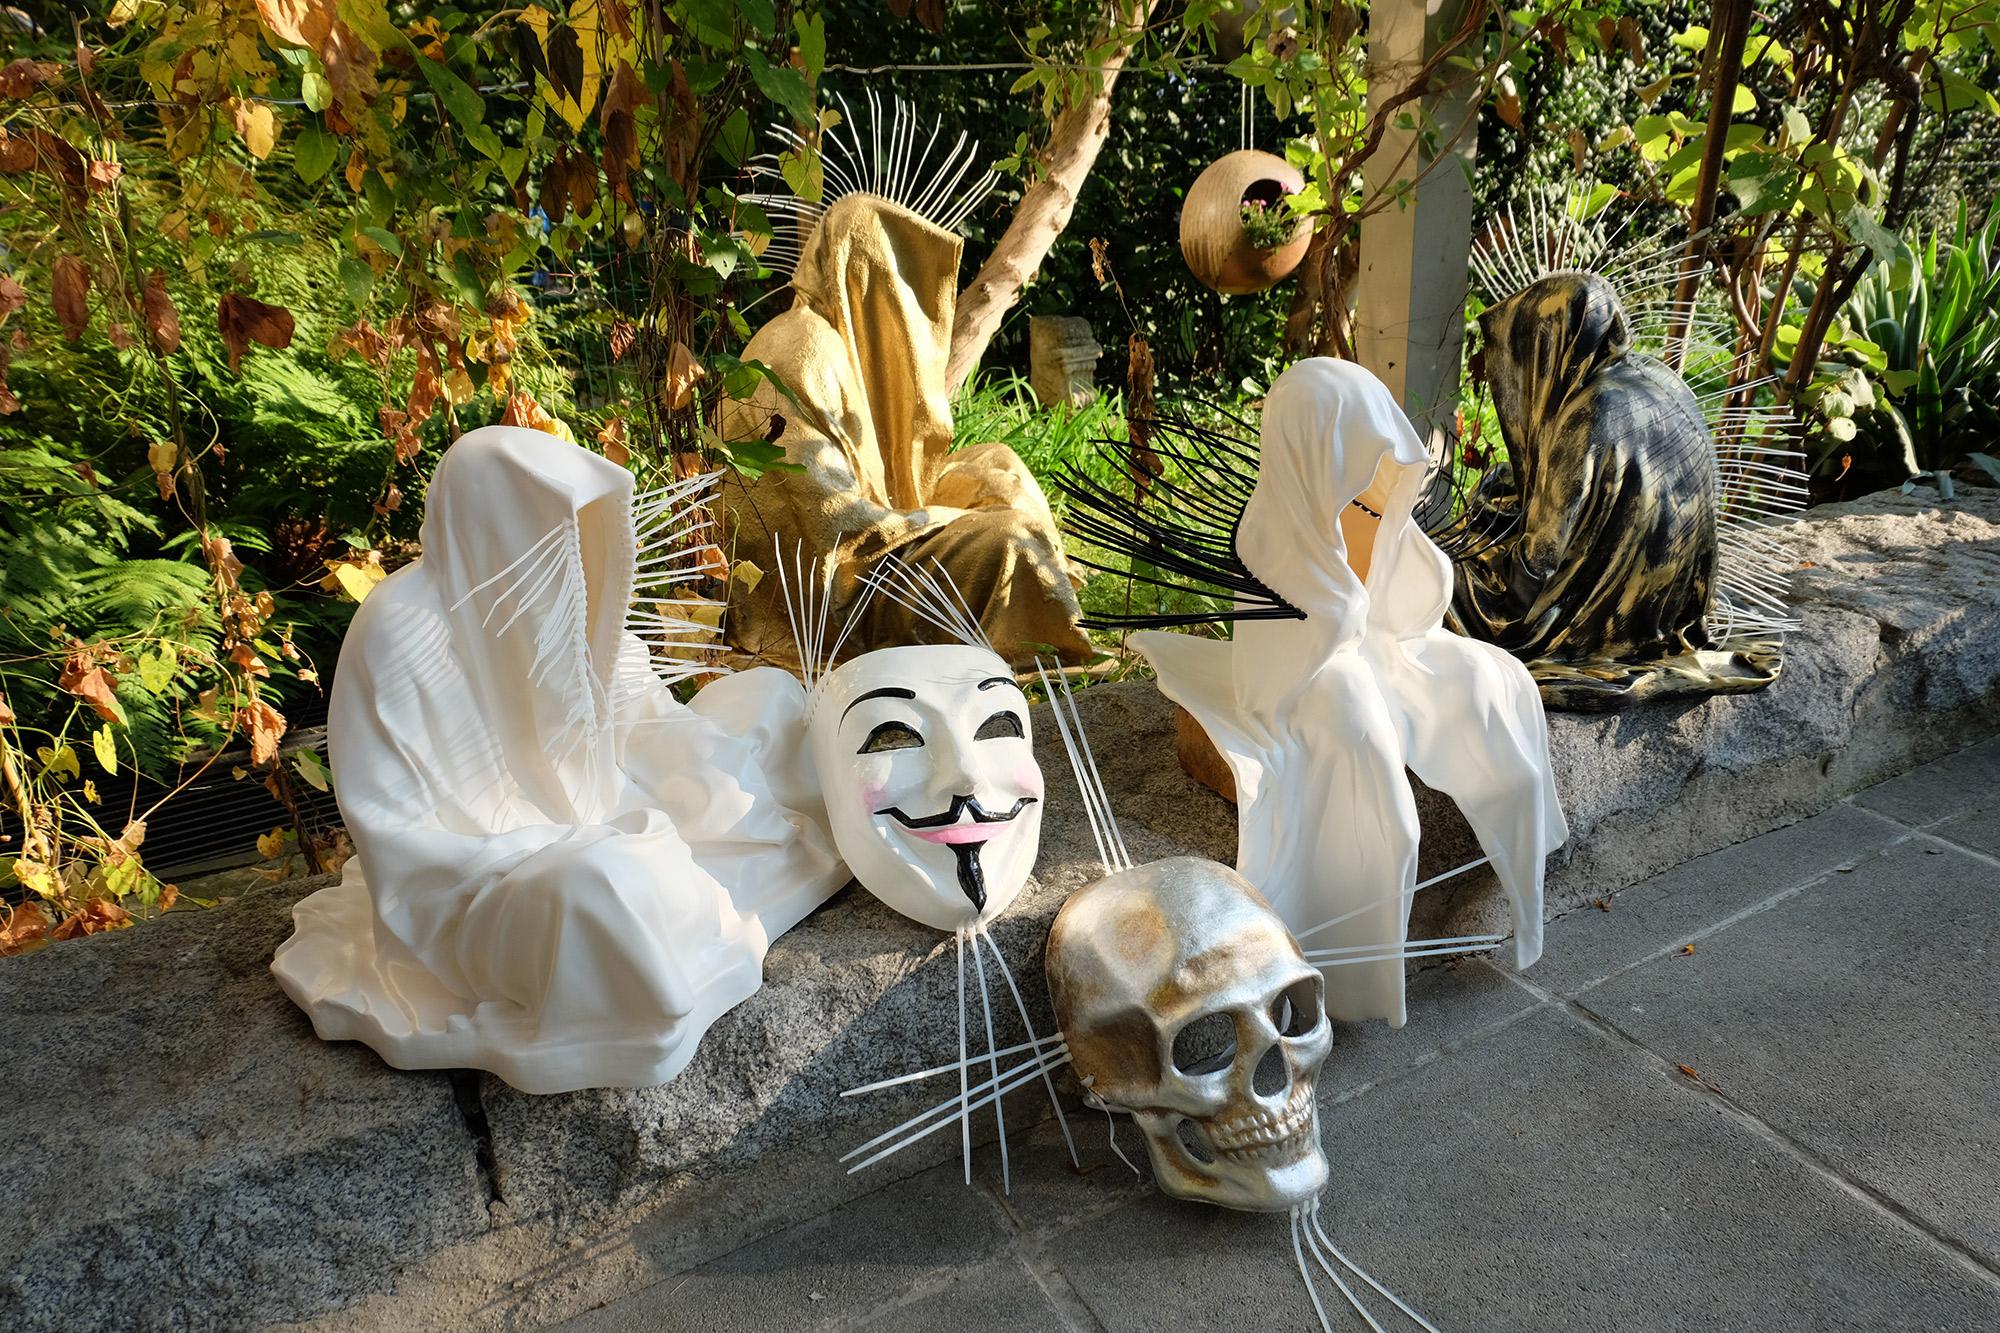 #faceless-#mask-#cableties-#ziptie-ty-#guardiansoftime-#manfredkielnhofer-#contemporaryart-#arts-#design-#sculpture-#statue-#museum-#gallery-#fineart-#lightart-#ghost-#anonymous-8114